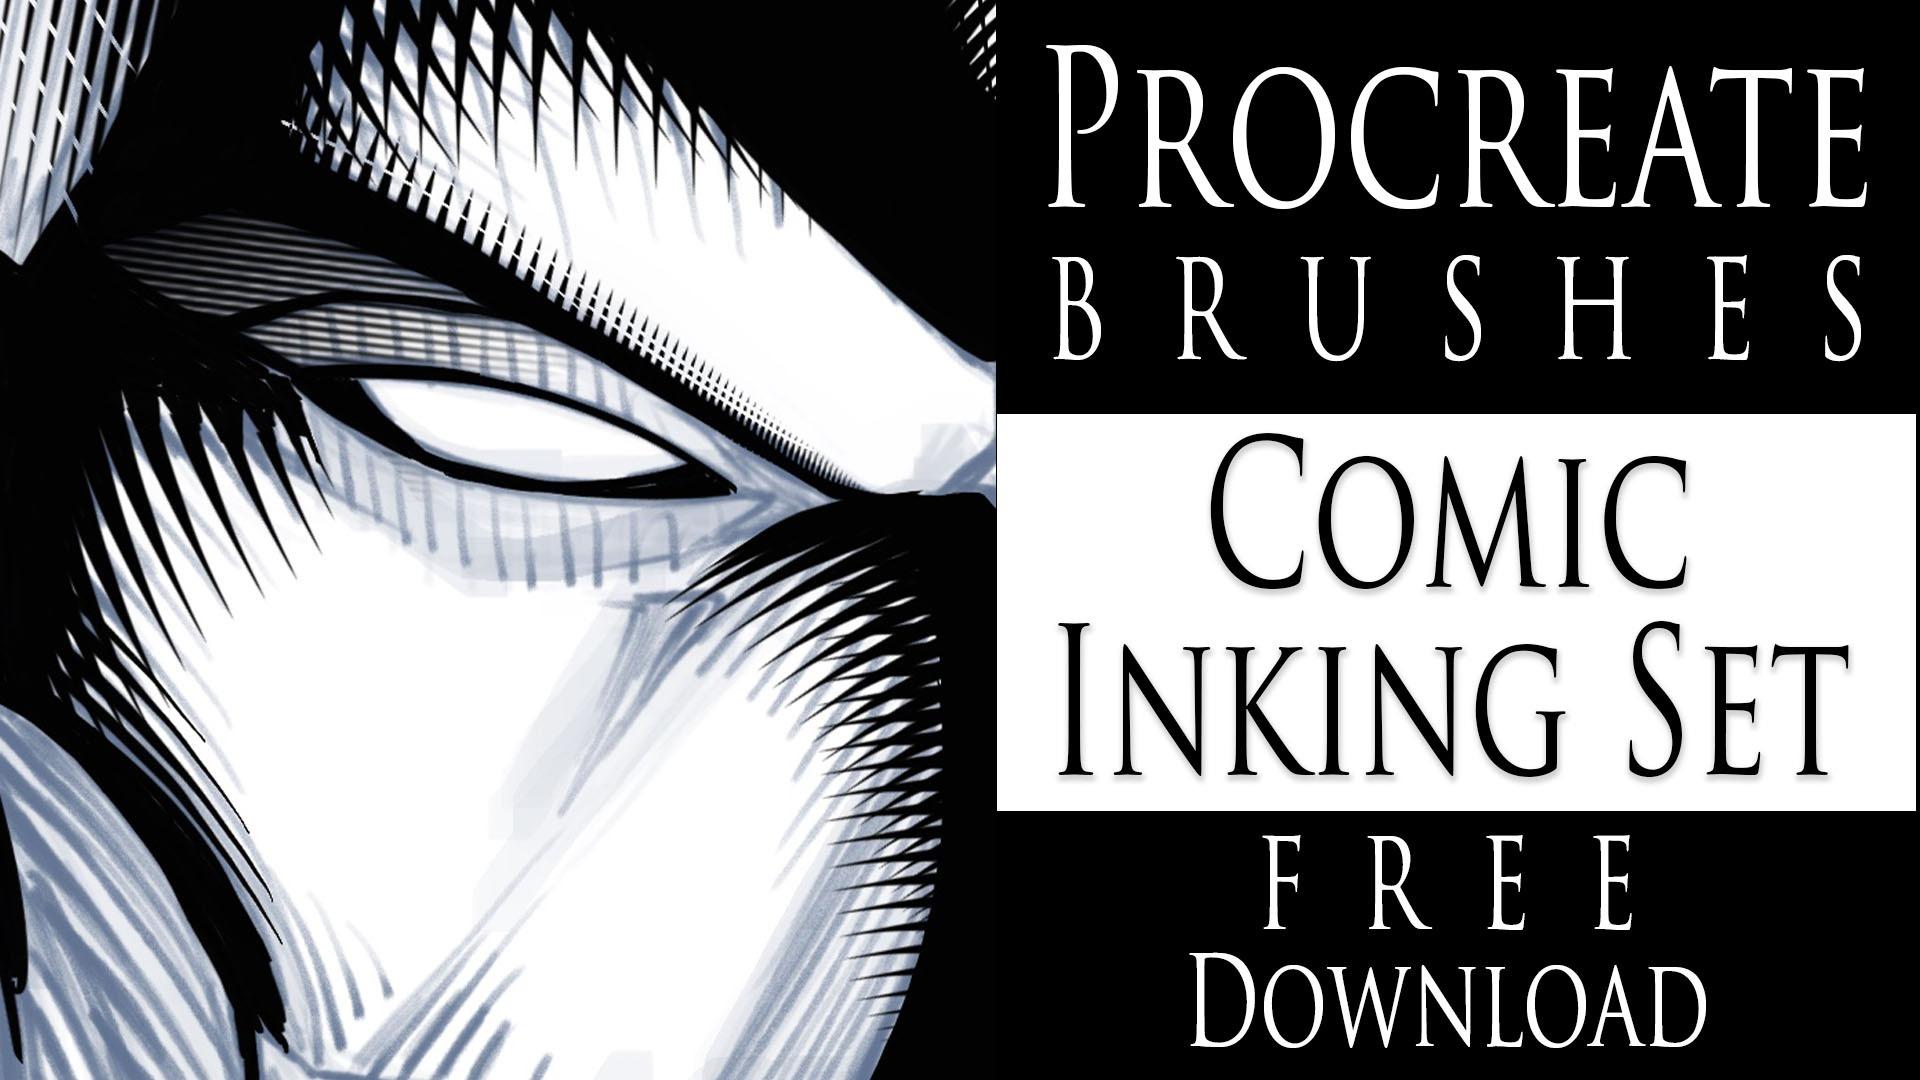 Procreate Brushes Comic Inking Set Free Download Ram Studios Comics